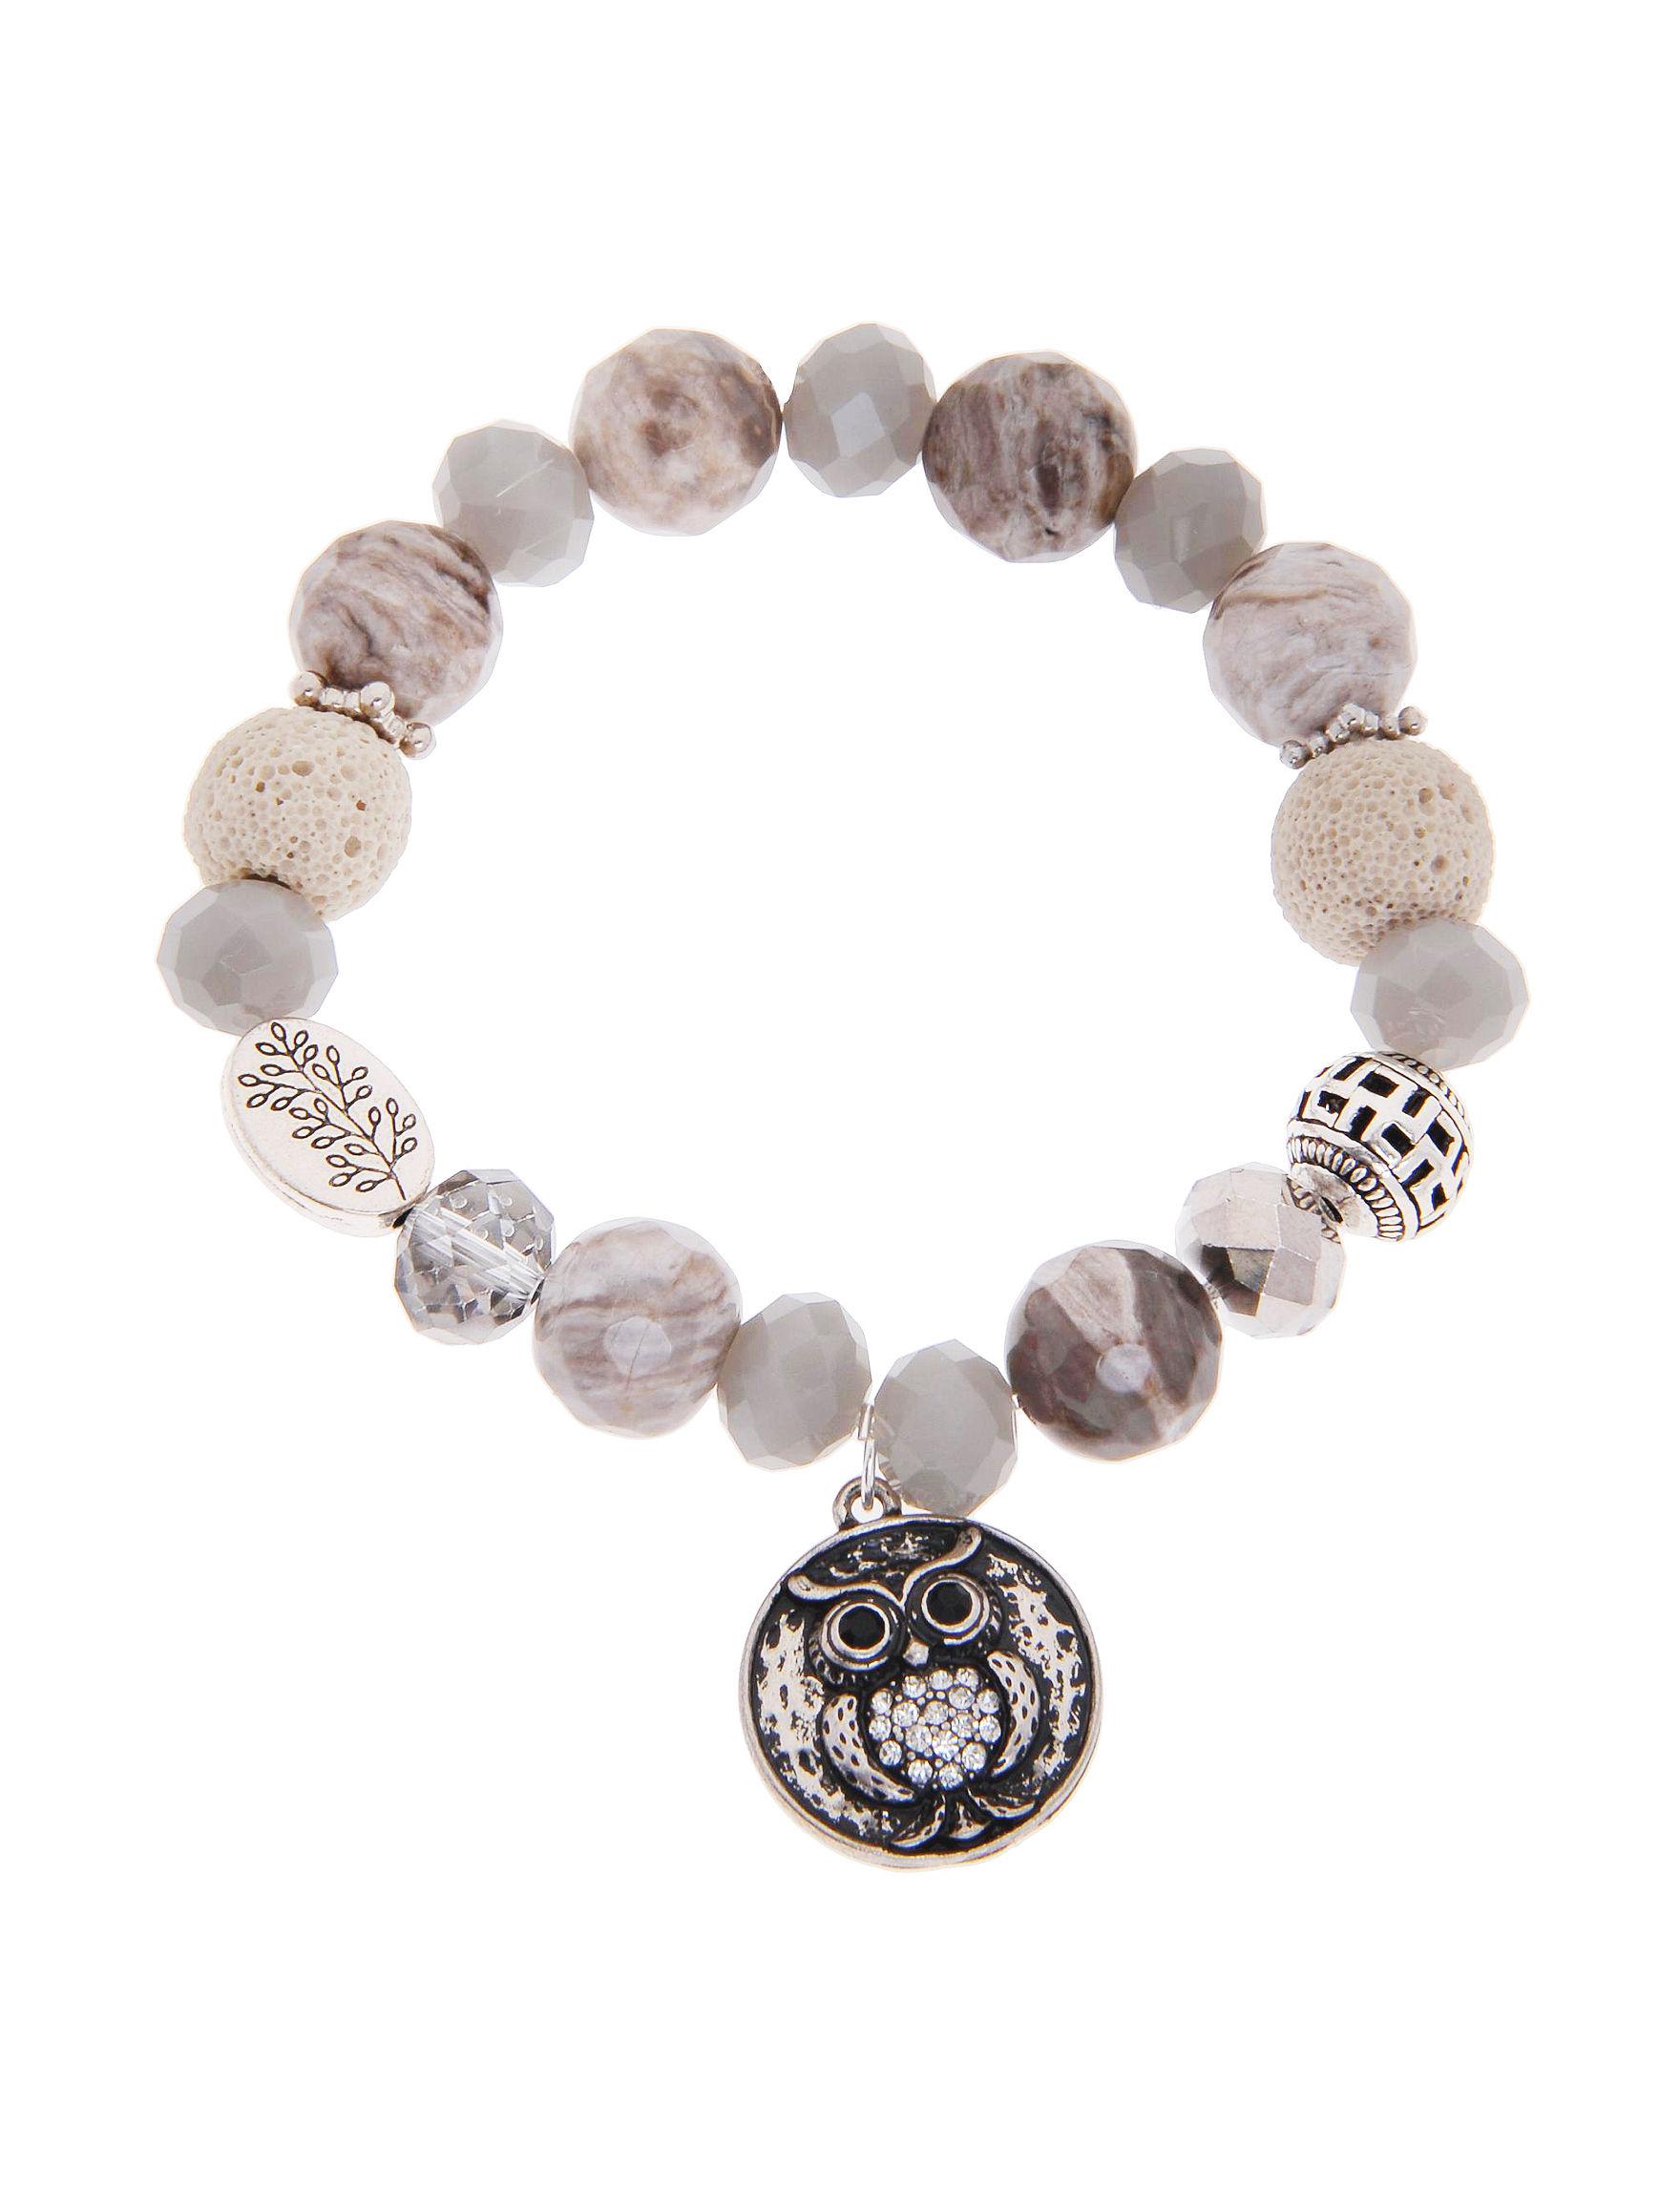 Tanya White / Silver Bracelets Fine Jewelry